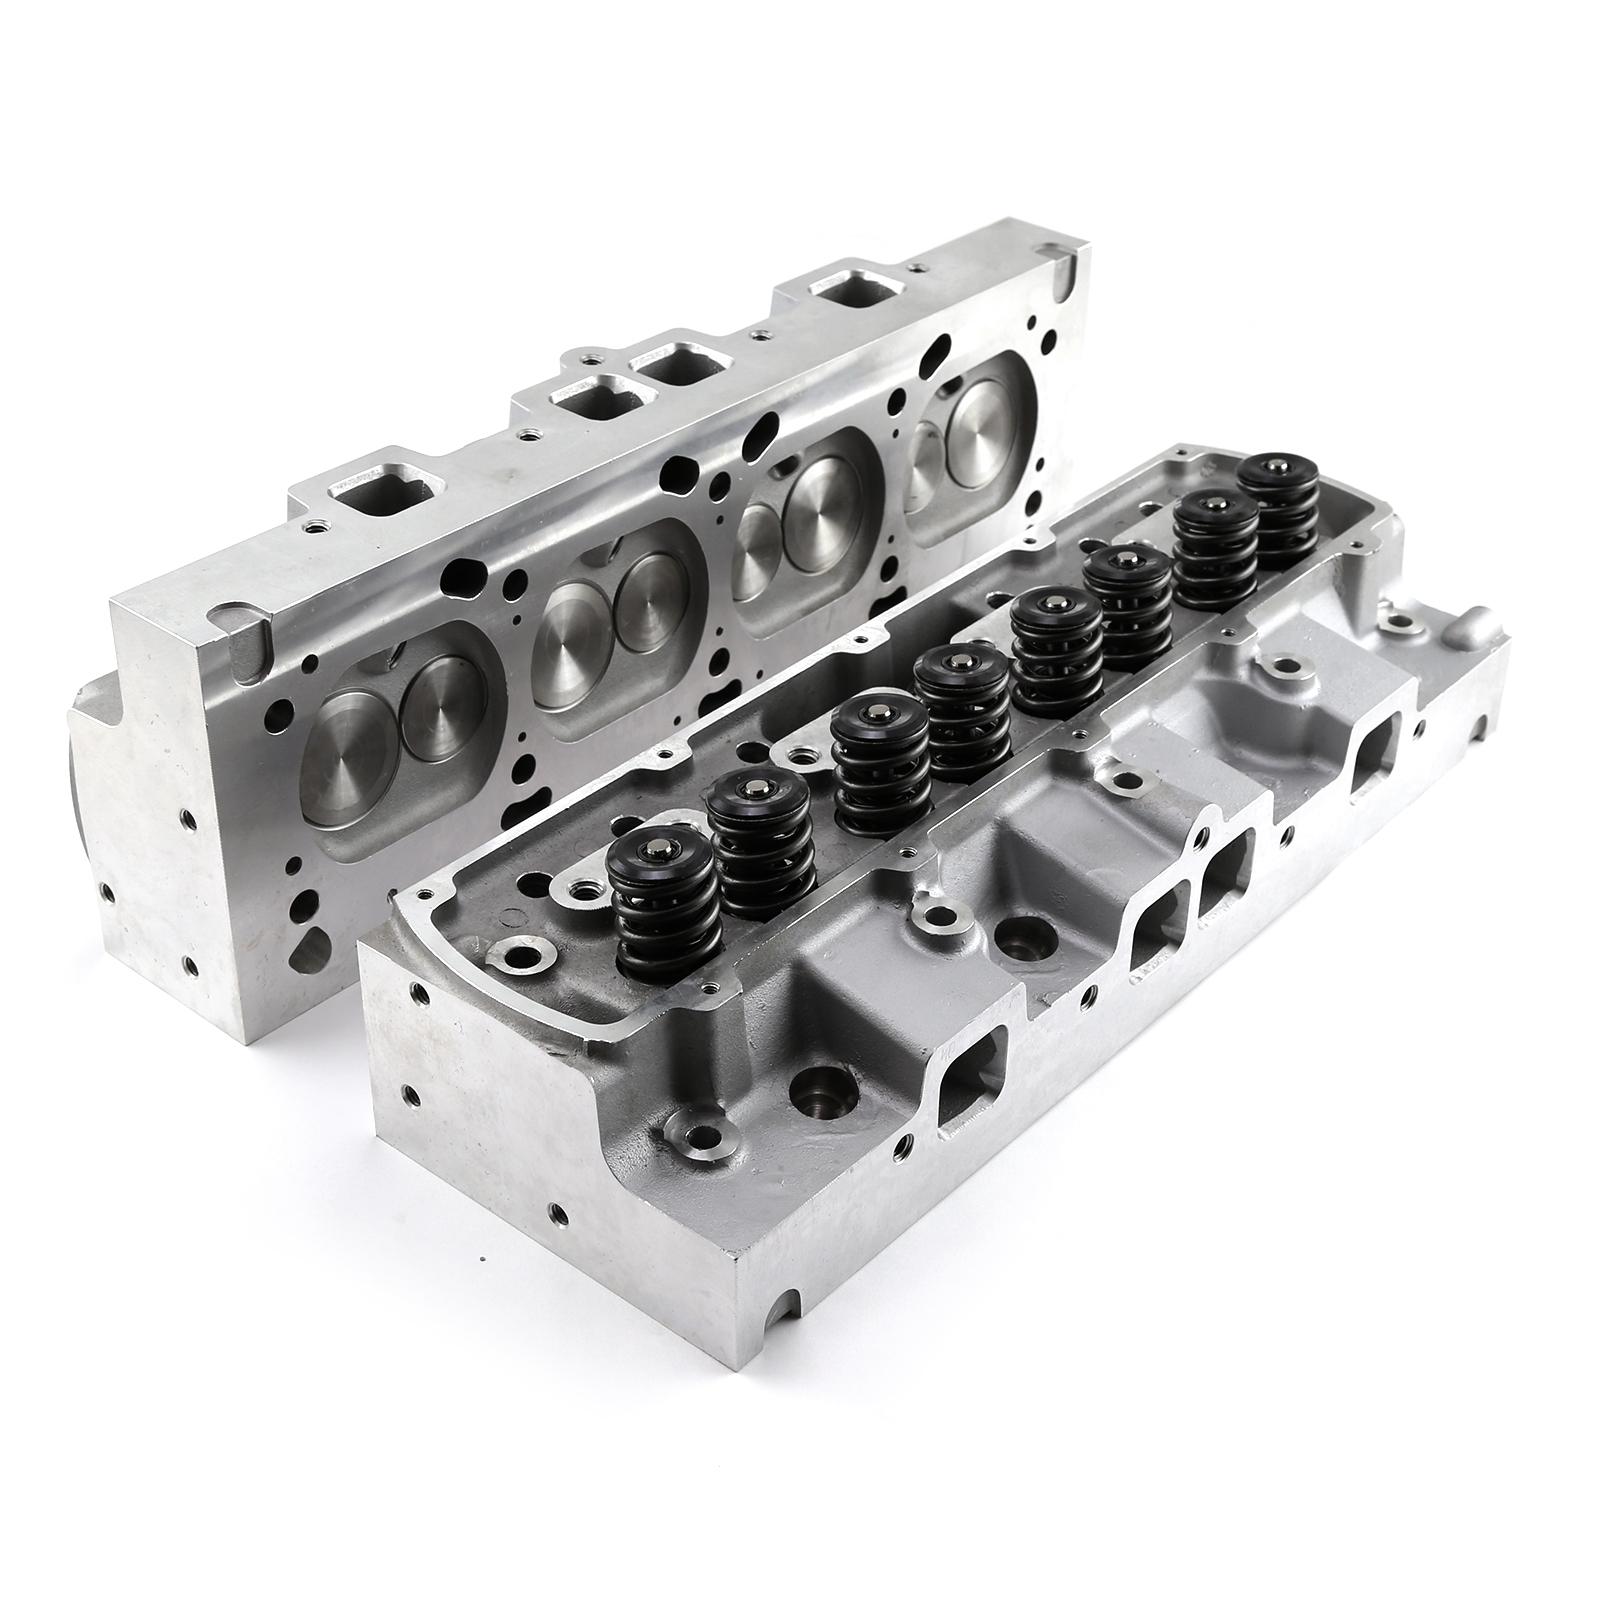 Oldsmobile 400 425 455 188cc 77cc Hydraulic Flat Assembled Cylinder Heads